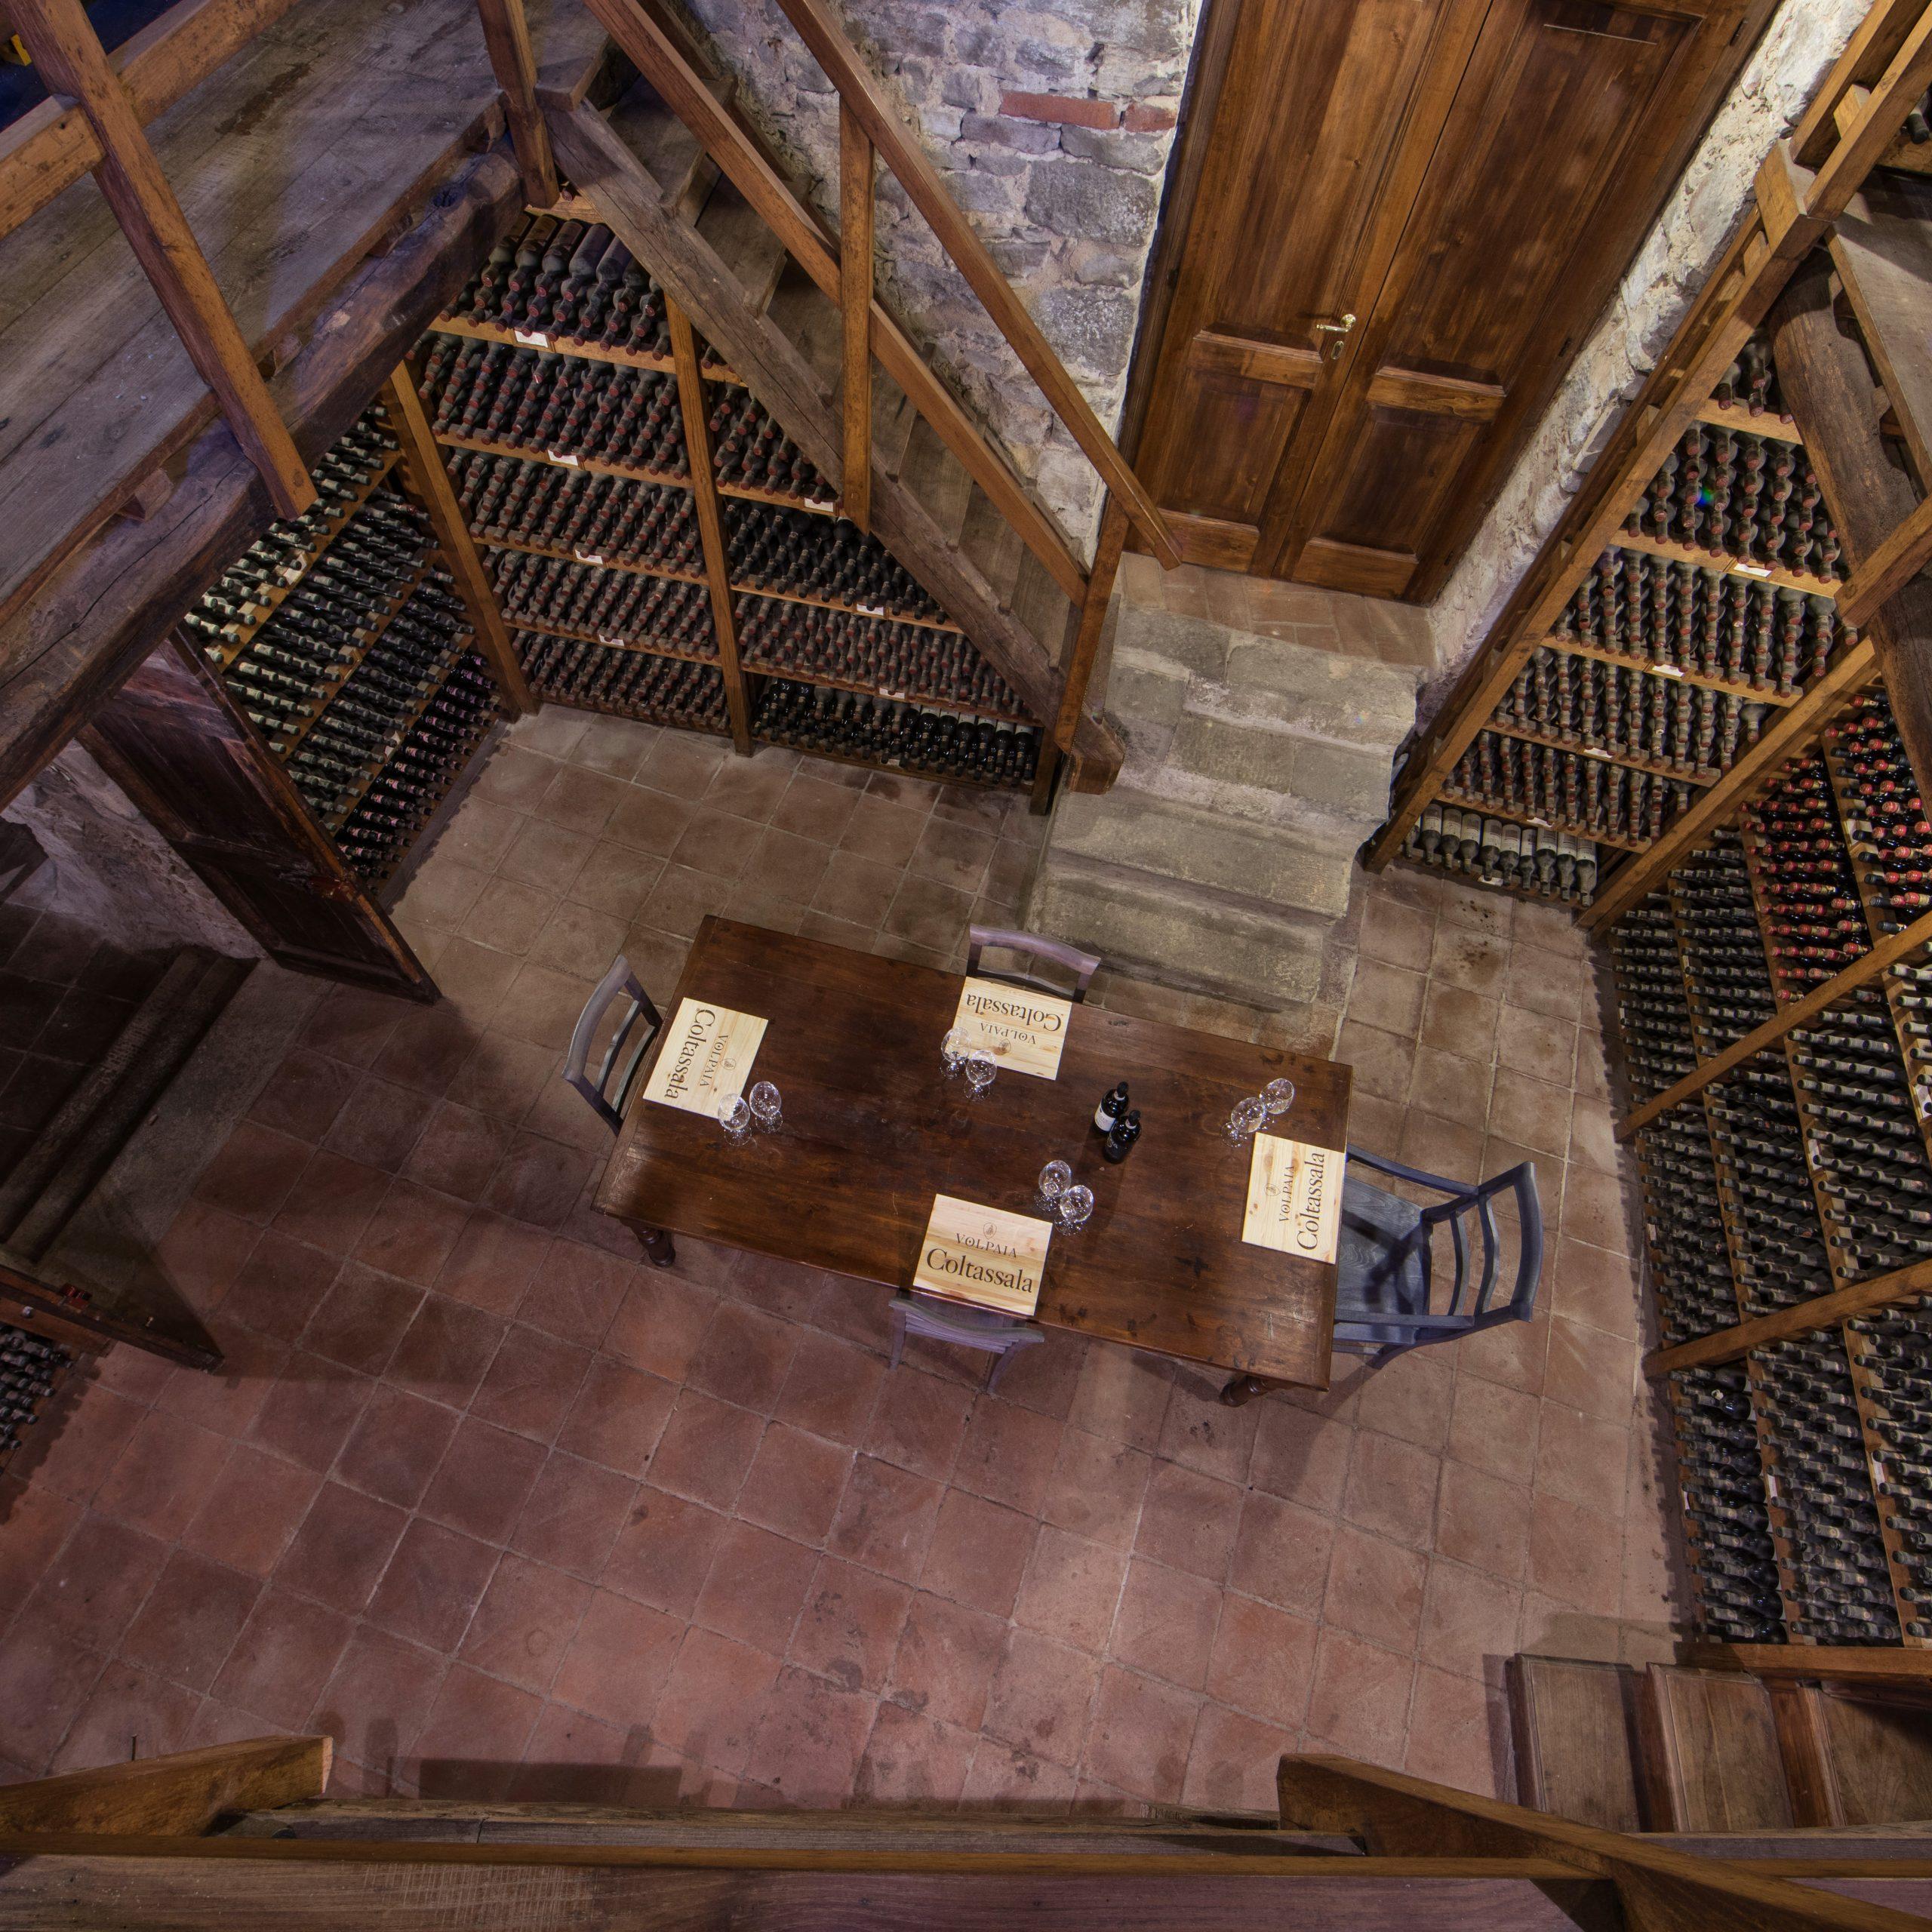 Degustazione di 4 vini